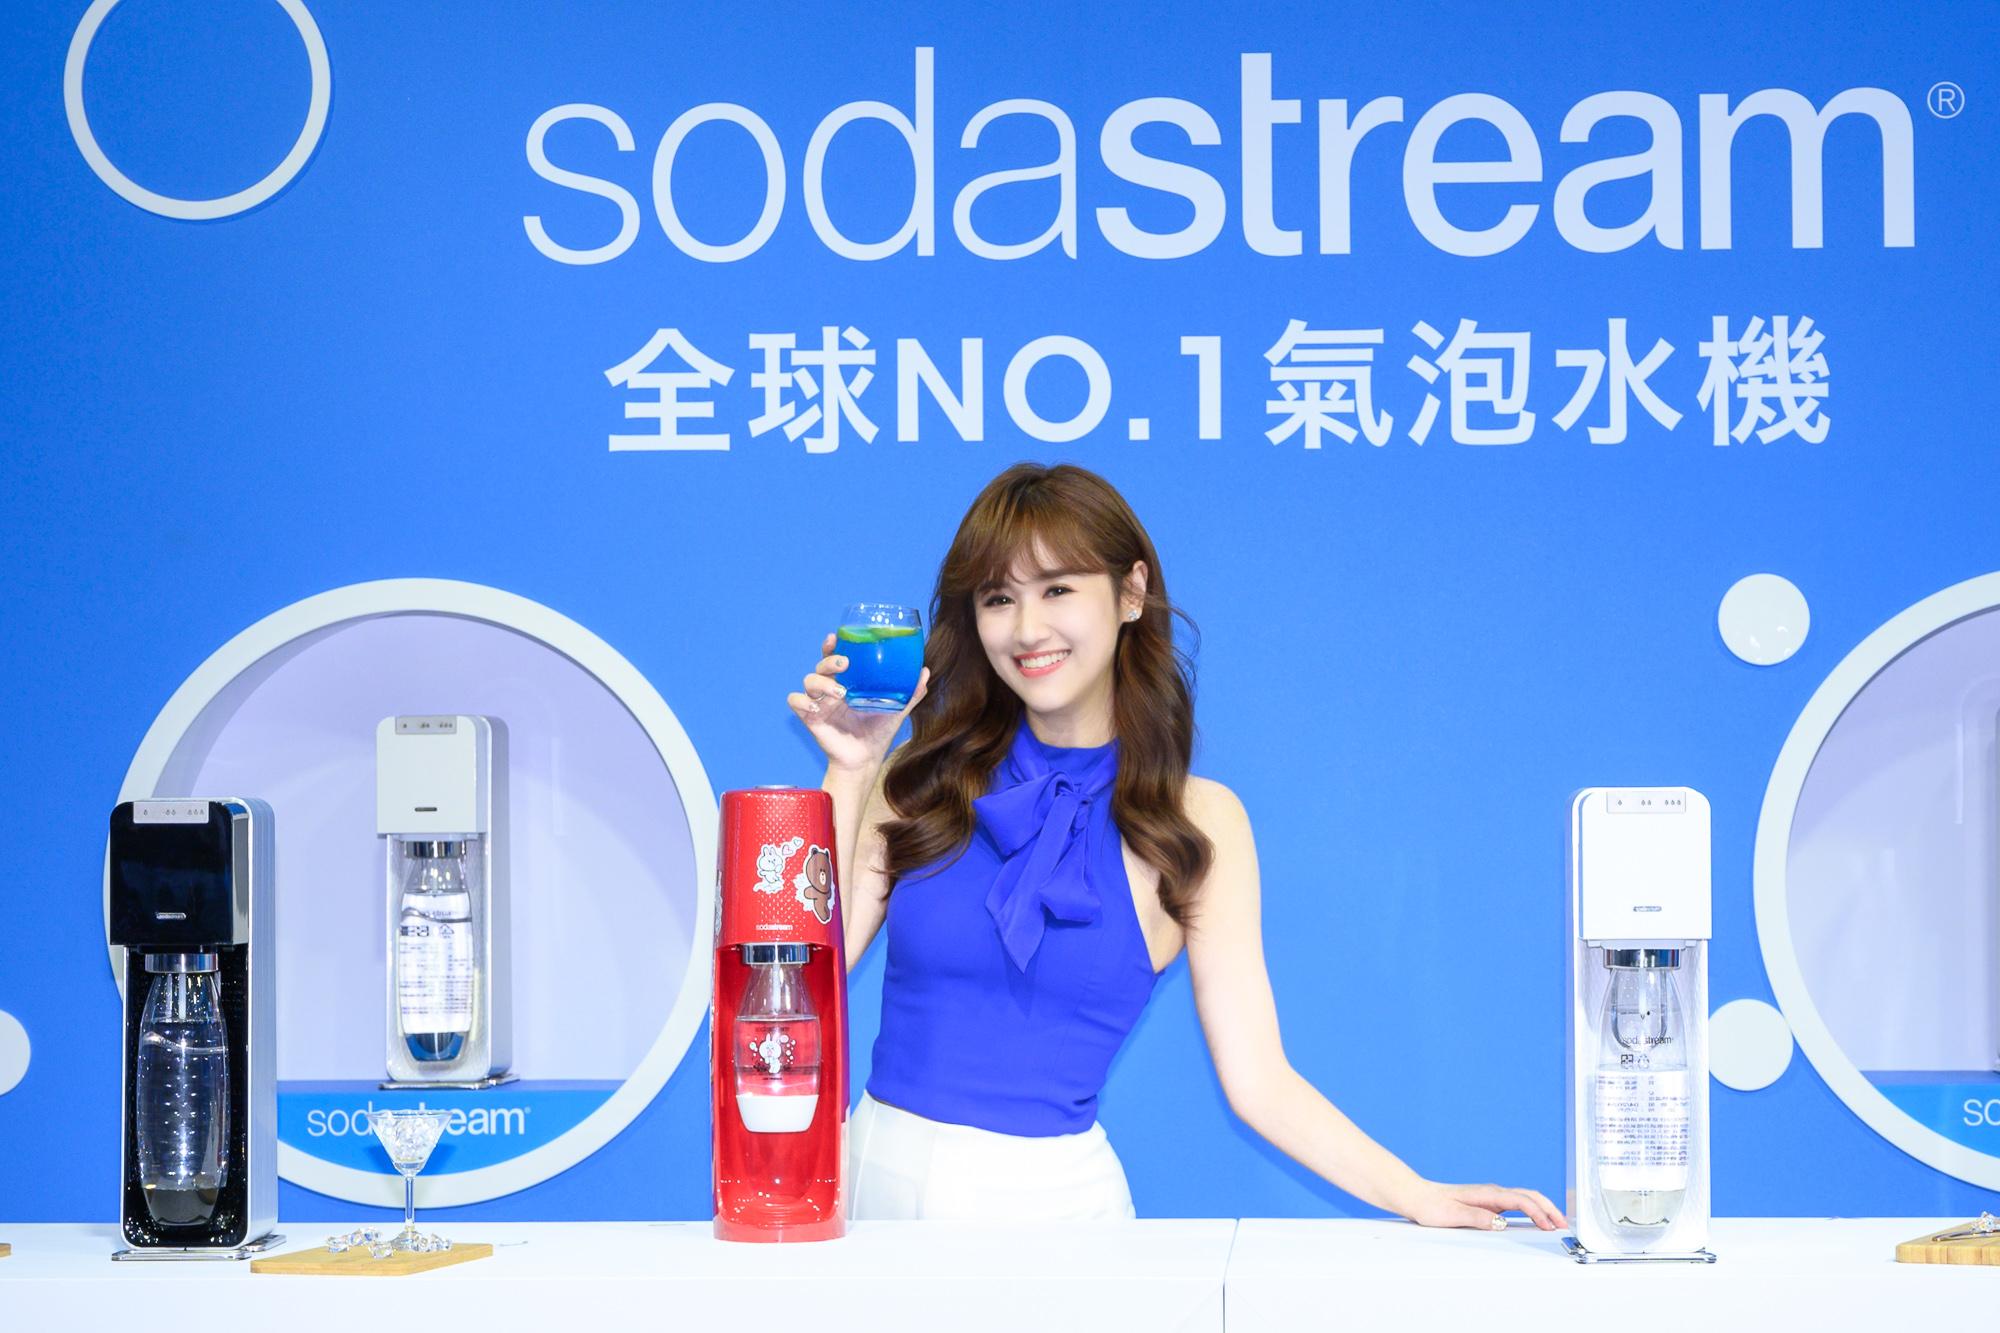 sodastream2020年攜手年度代言人吳姍儒,獨特「不必妥協 氣泡水特調」食譜公開,更獨家分享健康苗條身材離不開sodastream的保養身材之道!